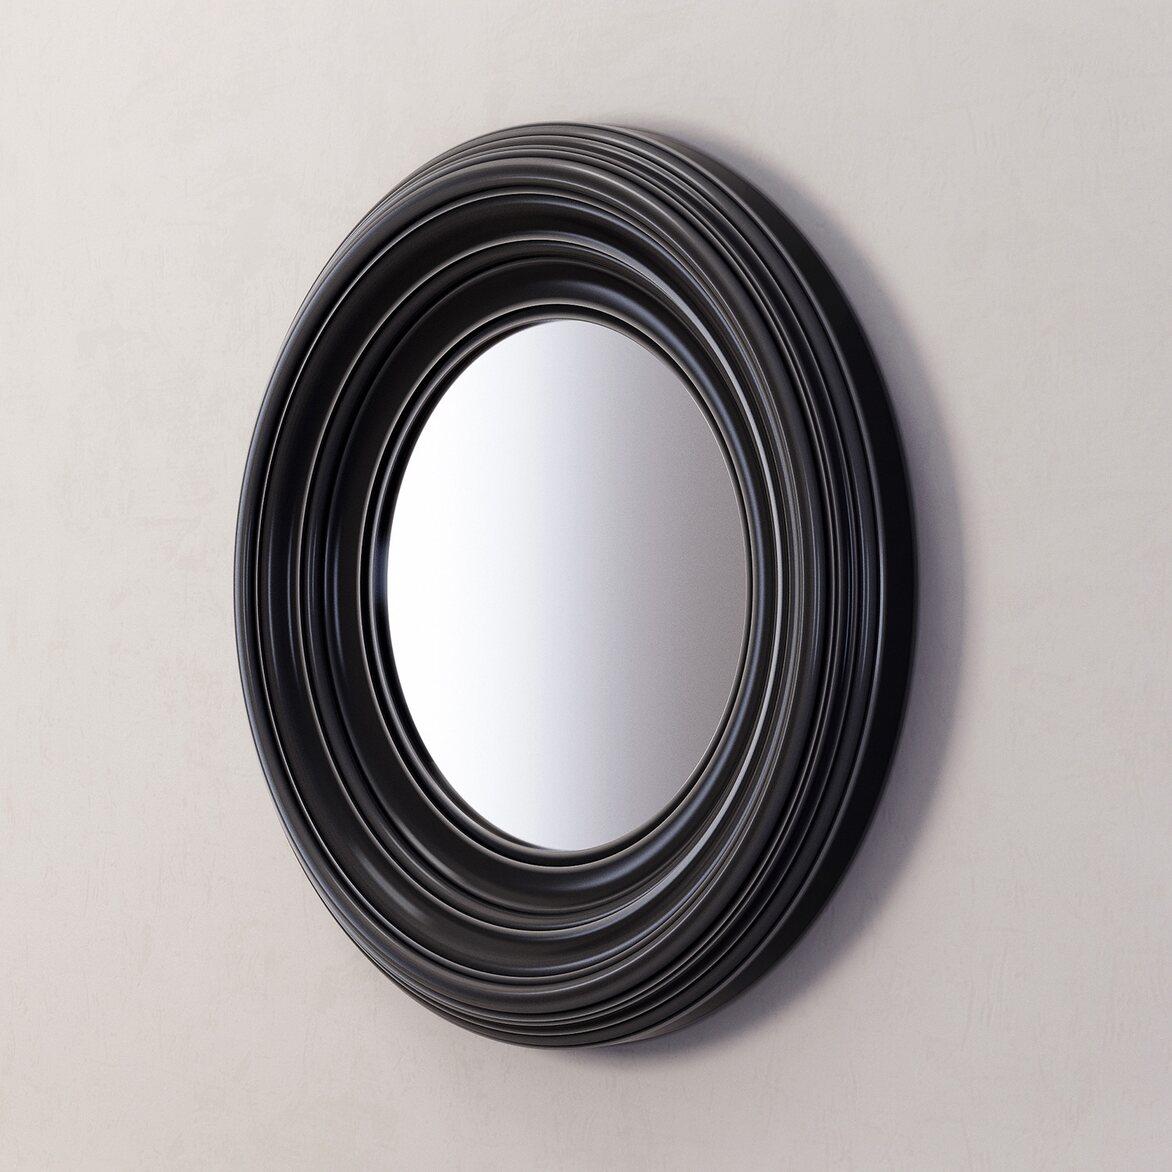 Зеркало Coventry, черное 2   Настенные зеркала Kingsby